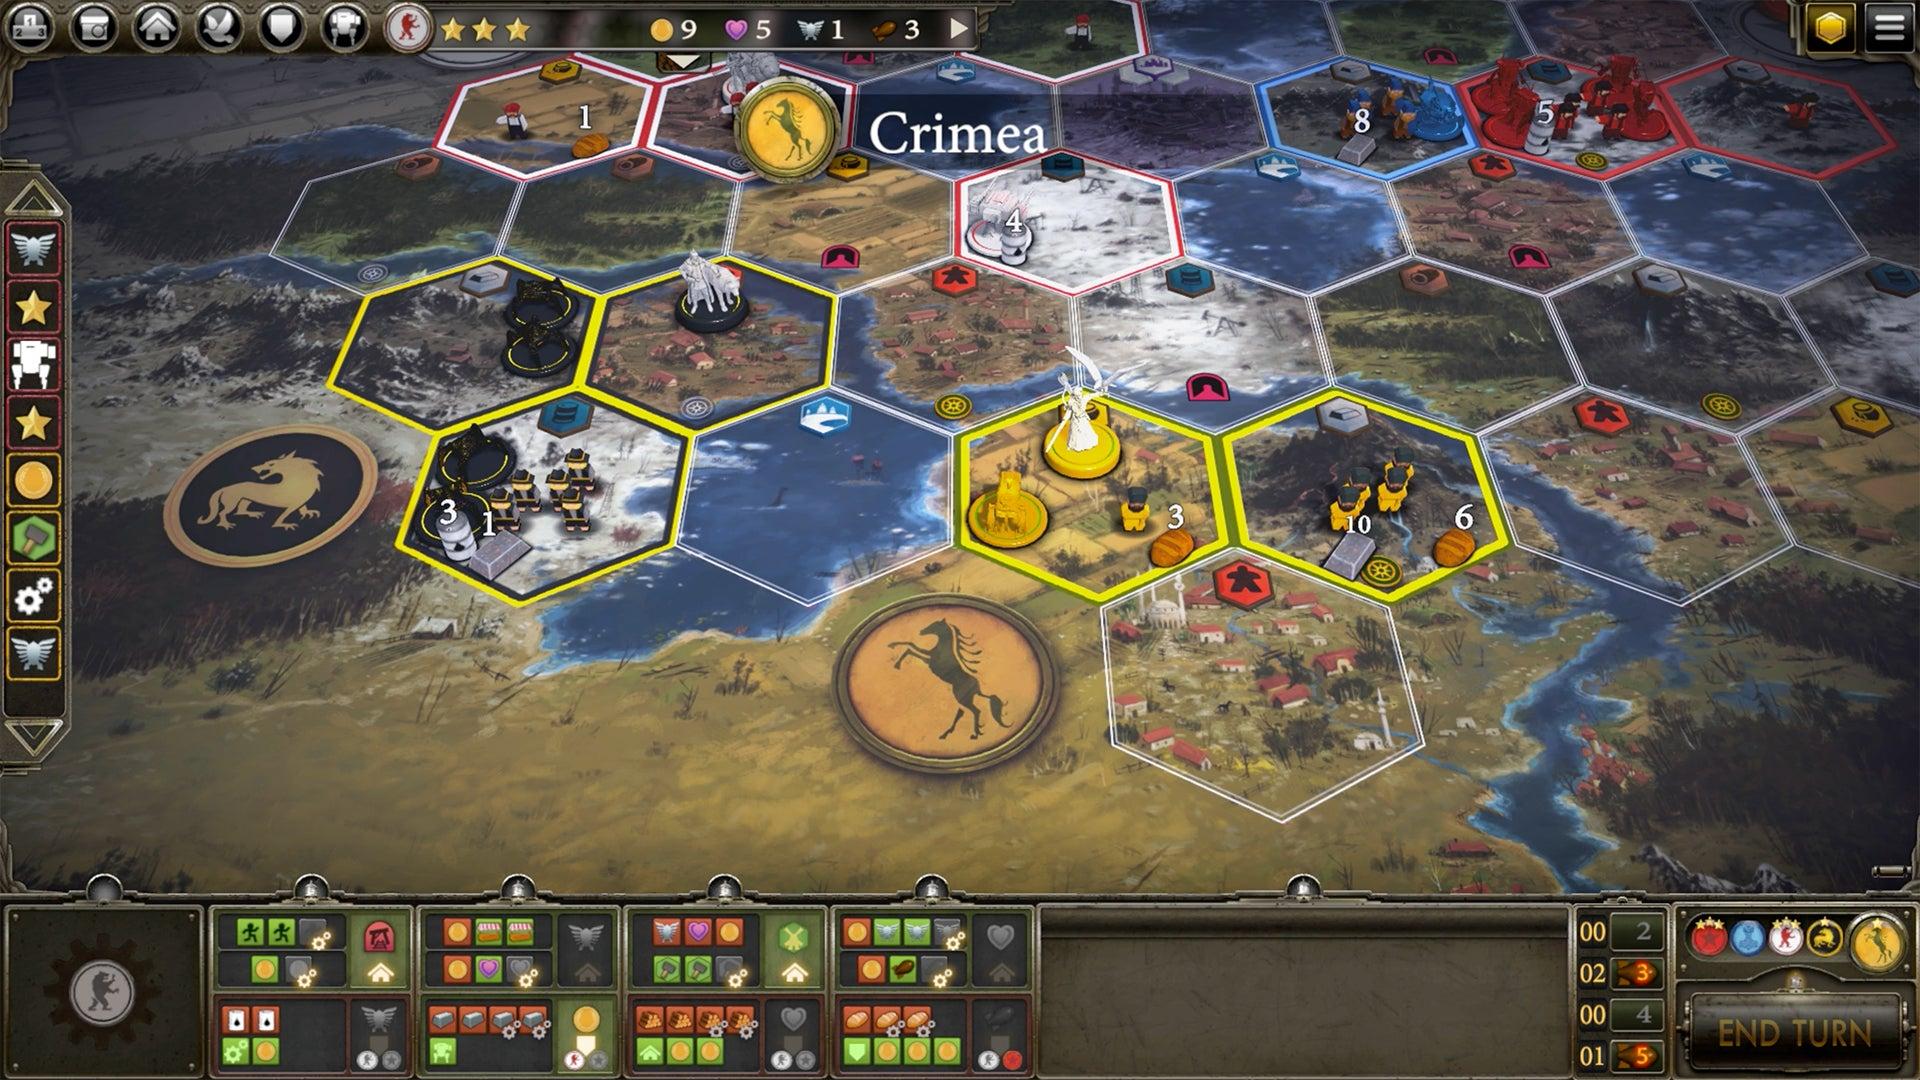 Scythe digital board game screenshot 2 steam